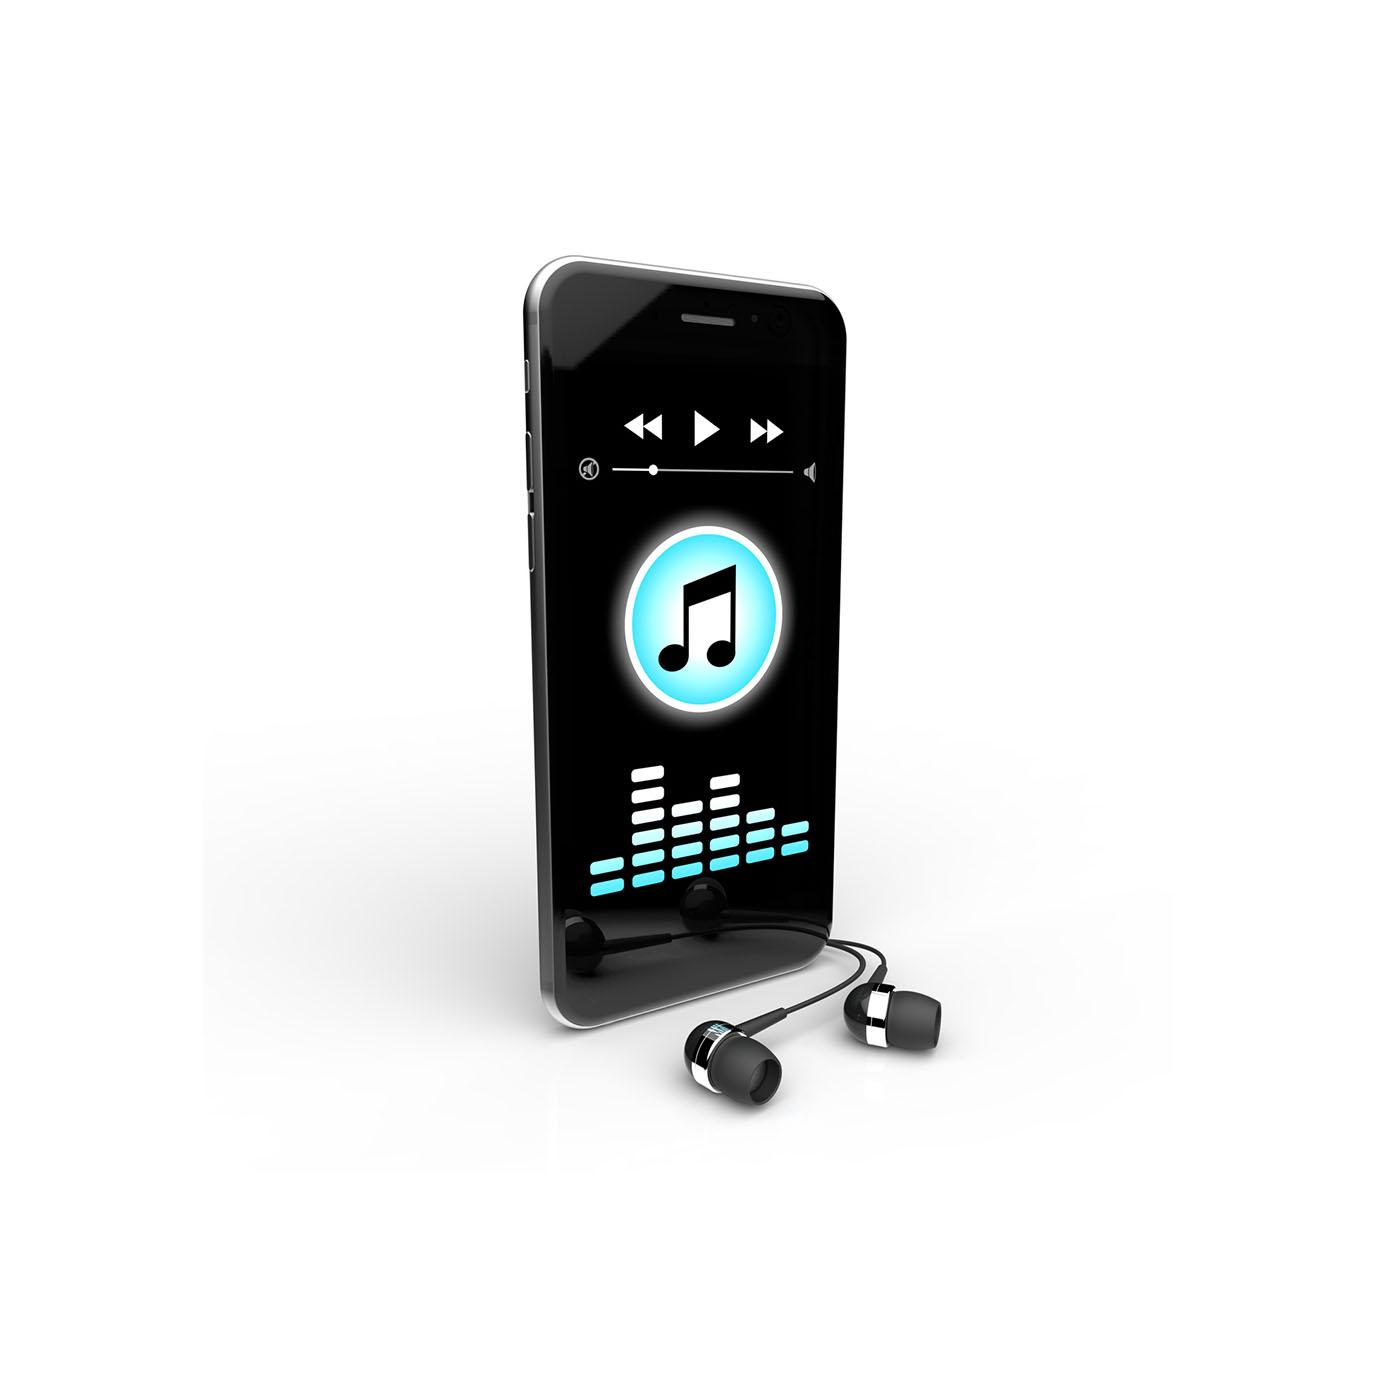 touchscreen mp3 player storefront. Black Bedroom Furniture Sets. Home Design Ideas